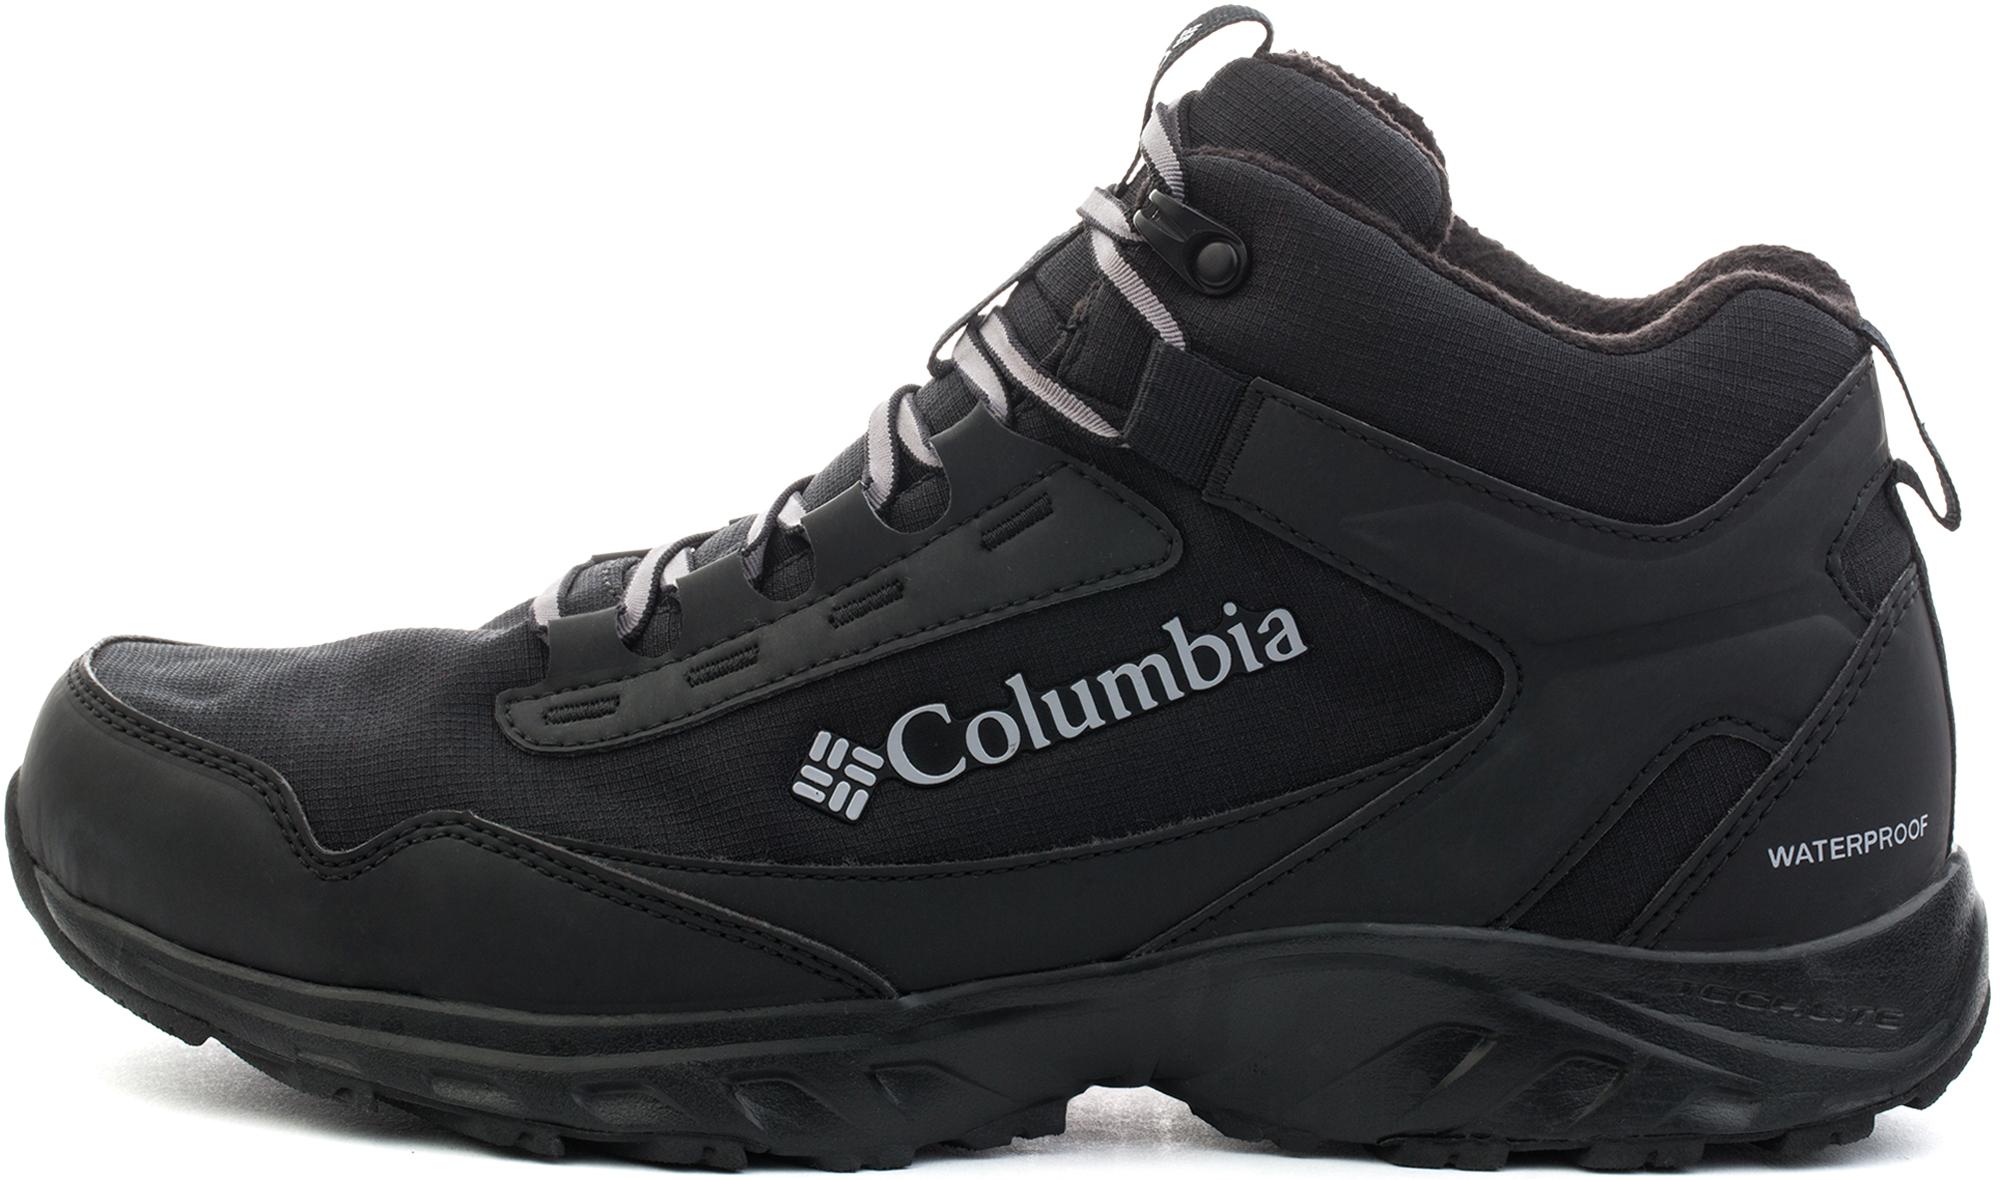 Columbia Ботинки мужские Irrigon Trail, размер 46